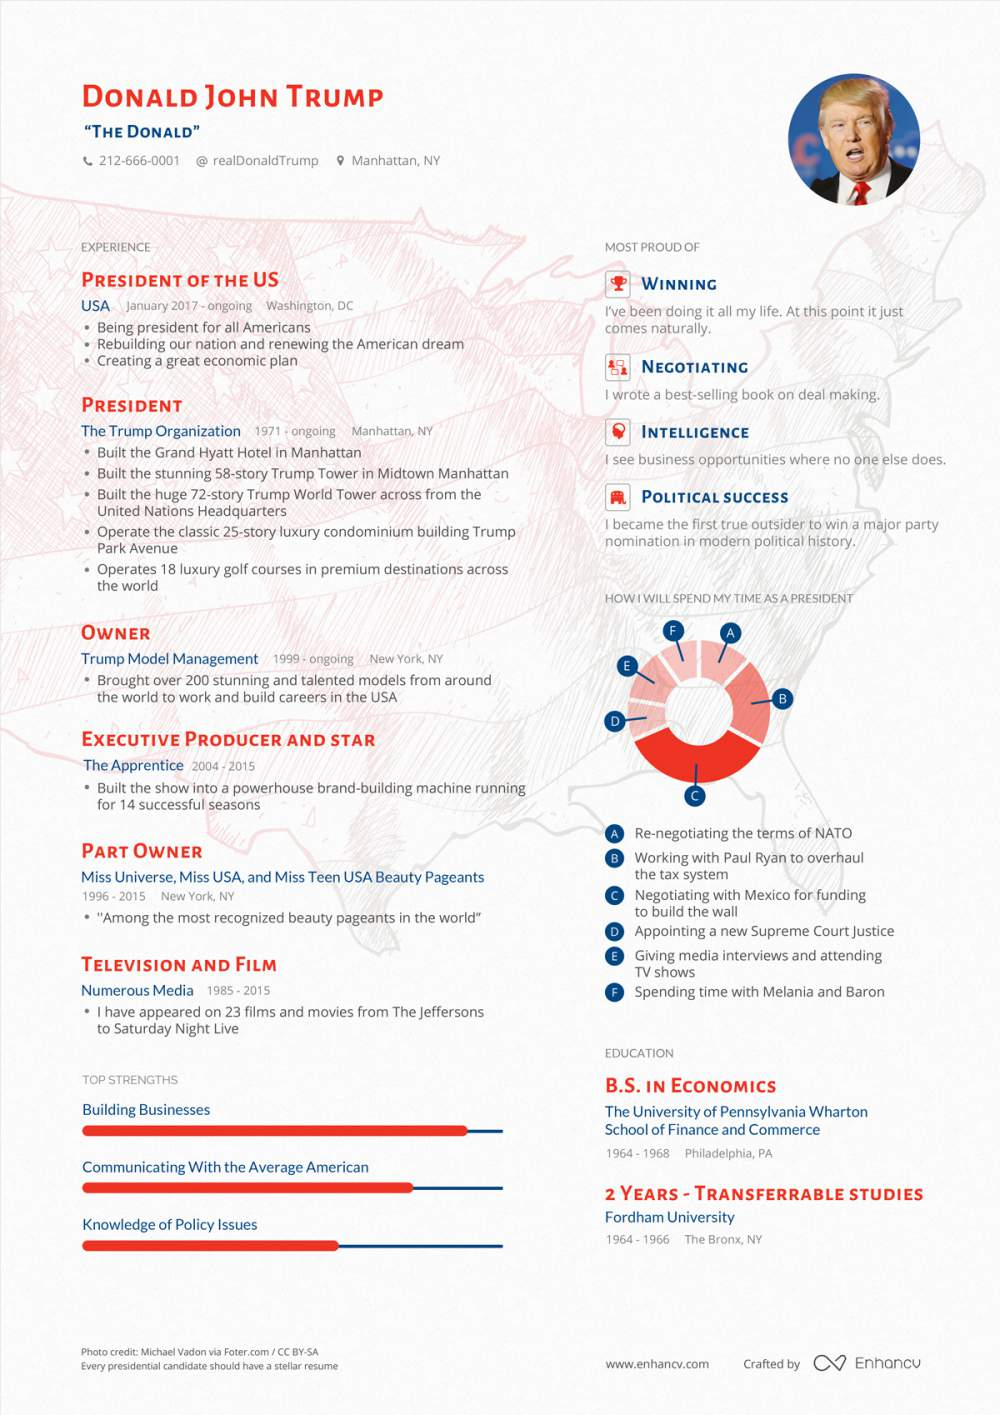 infographic source httpblogenhancvcomdonald trump